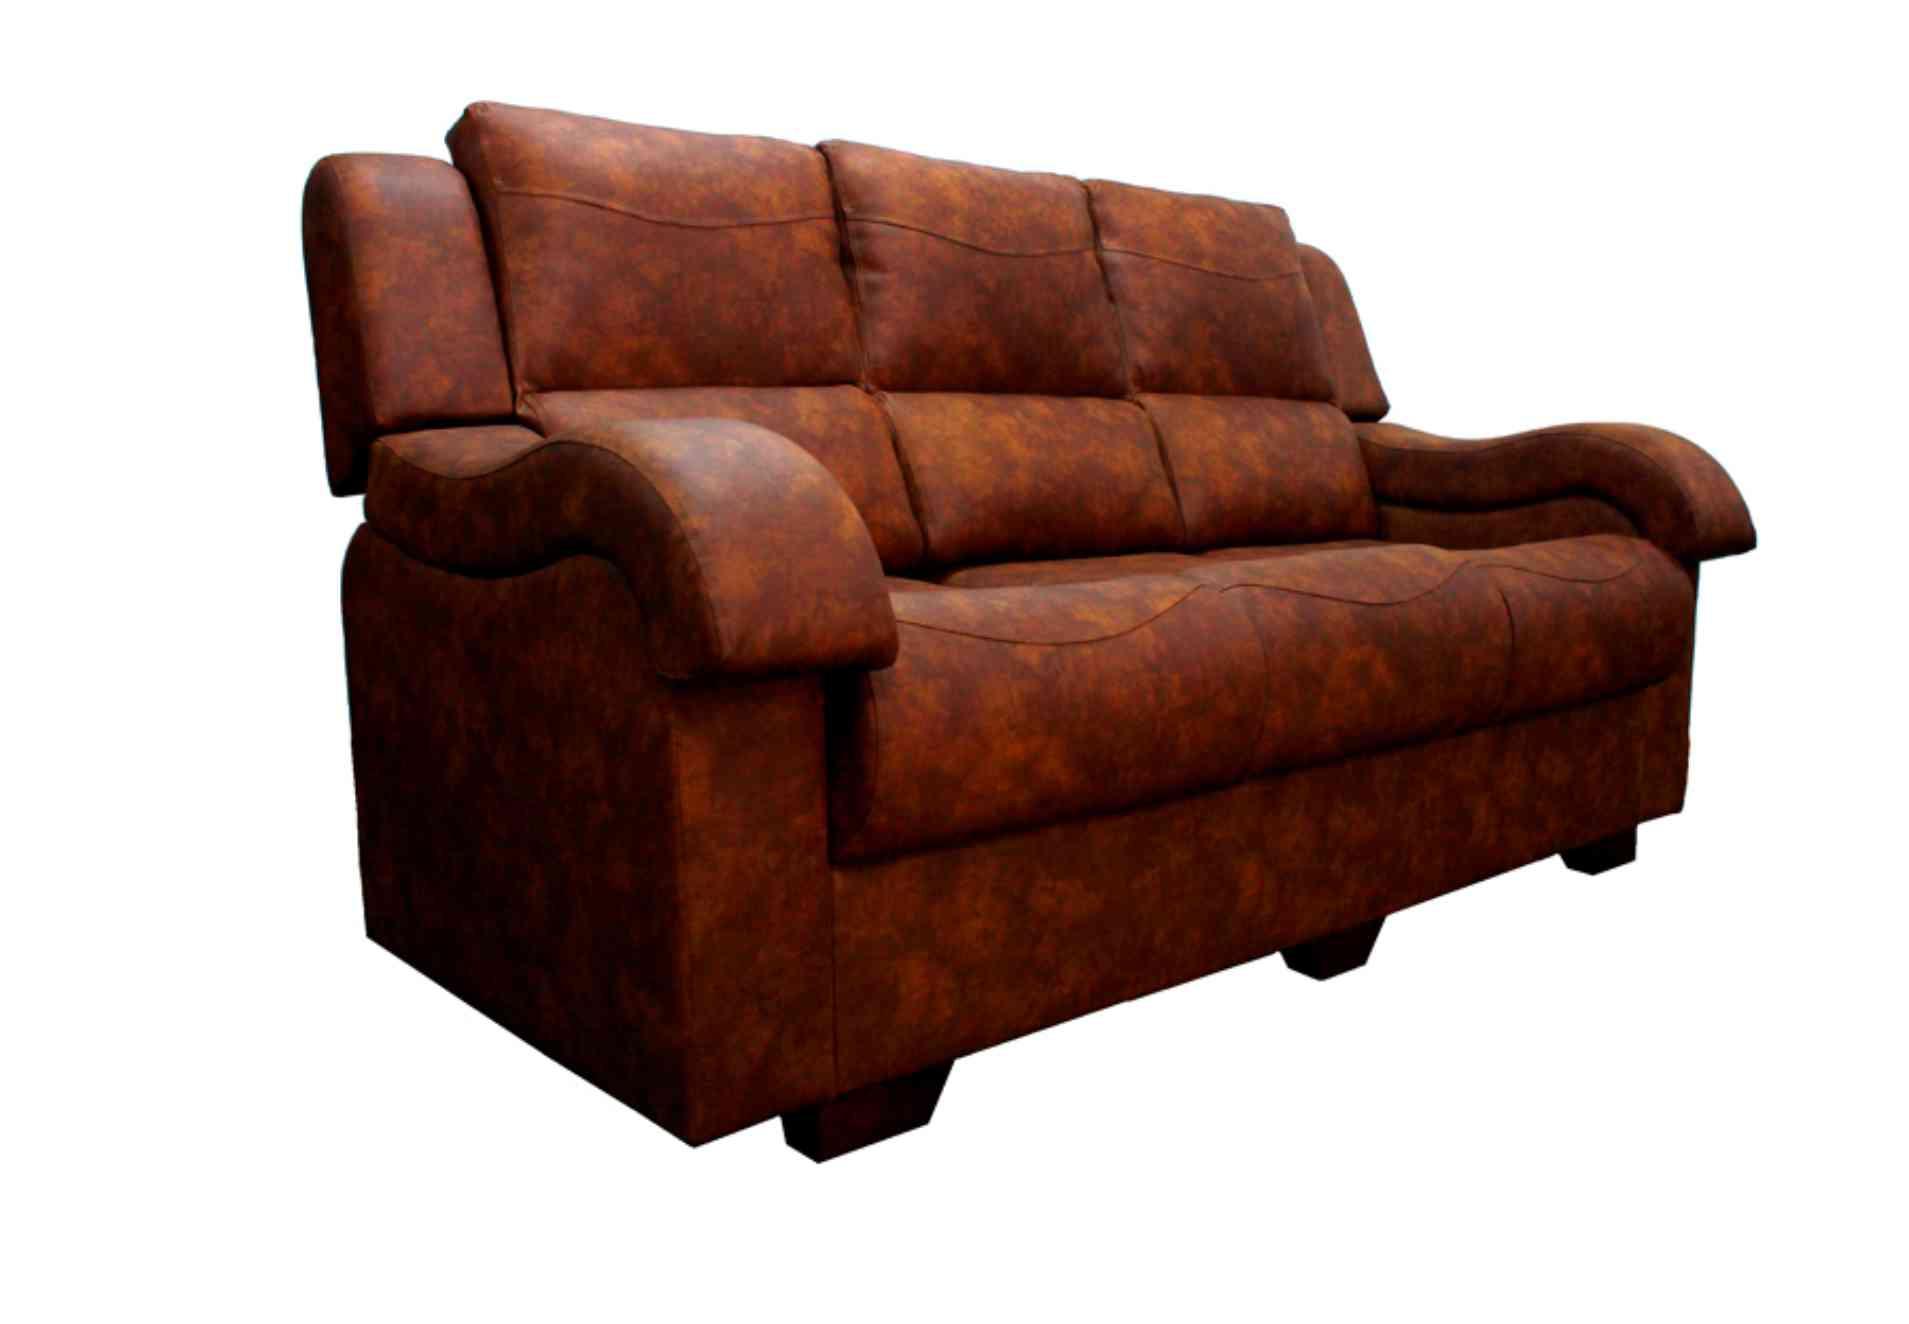 Sofa Muebles el Cid 1805